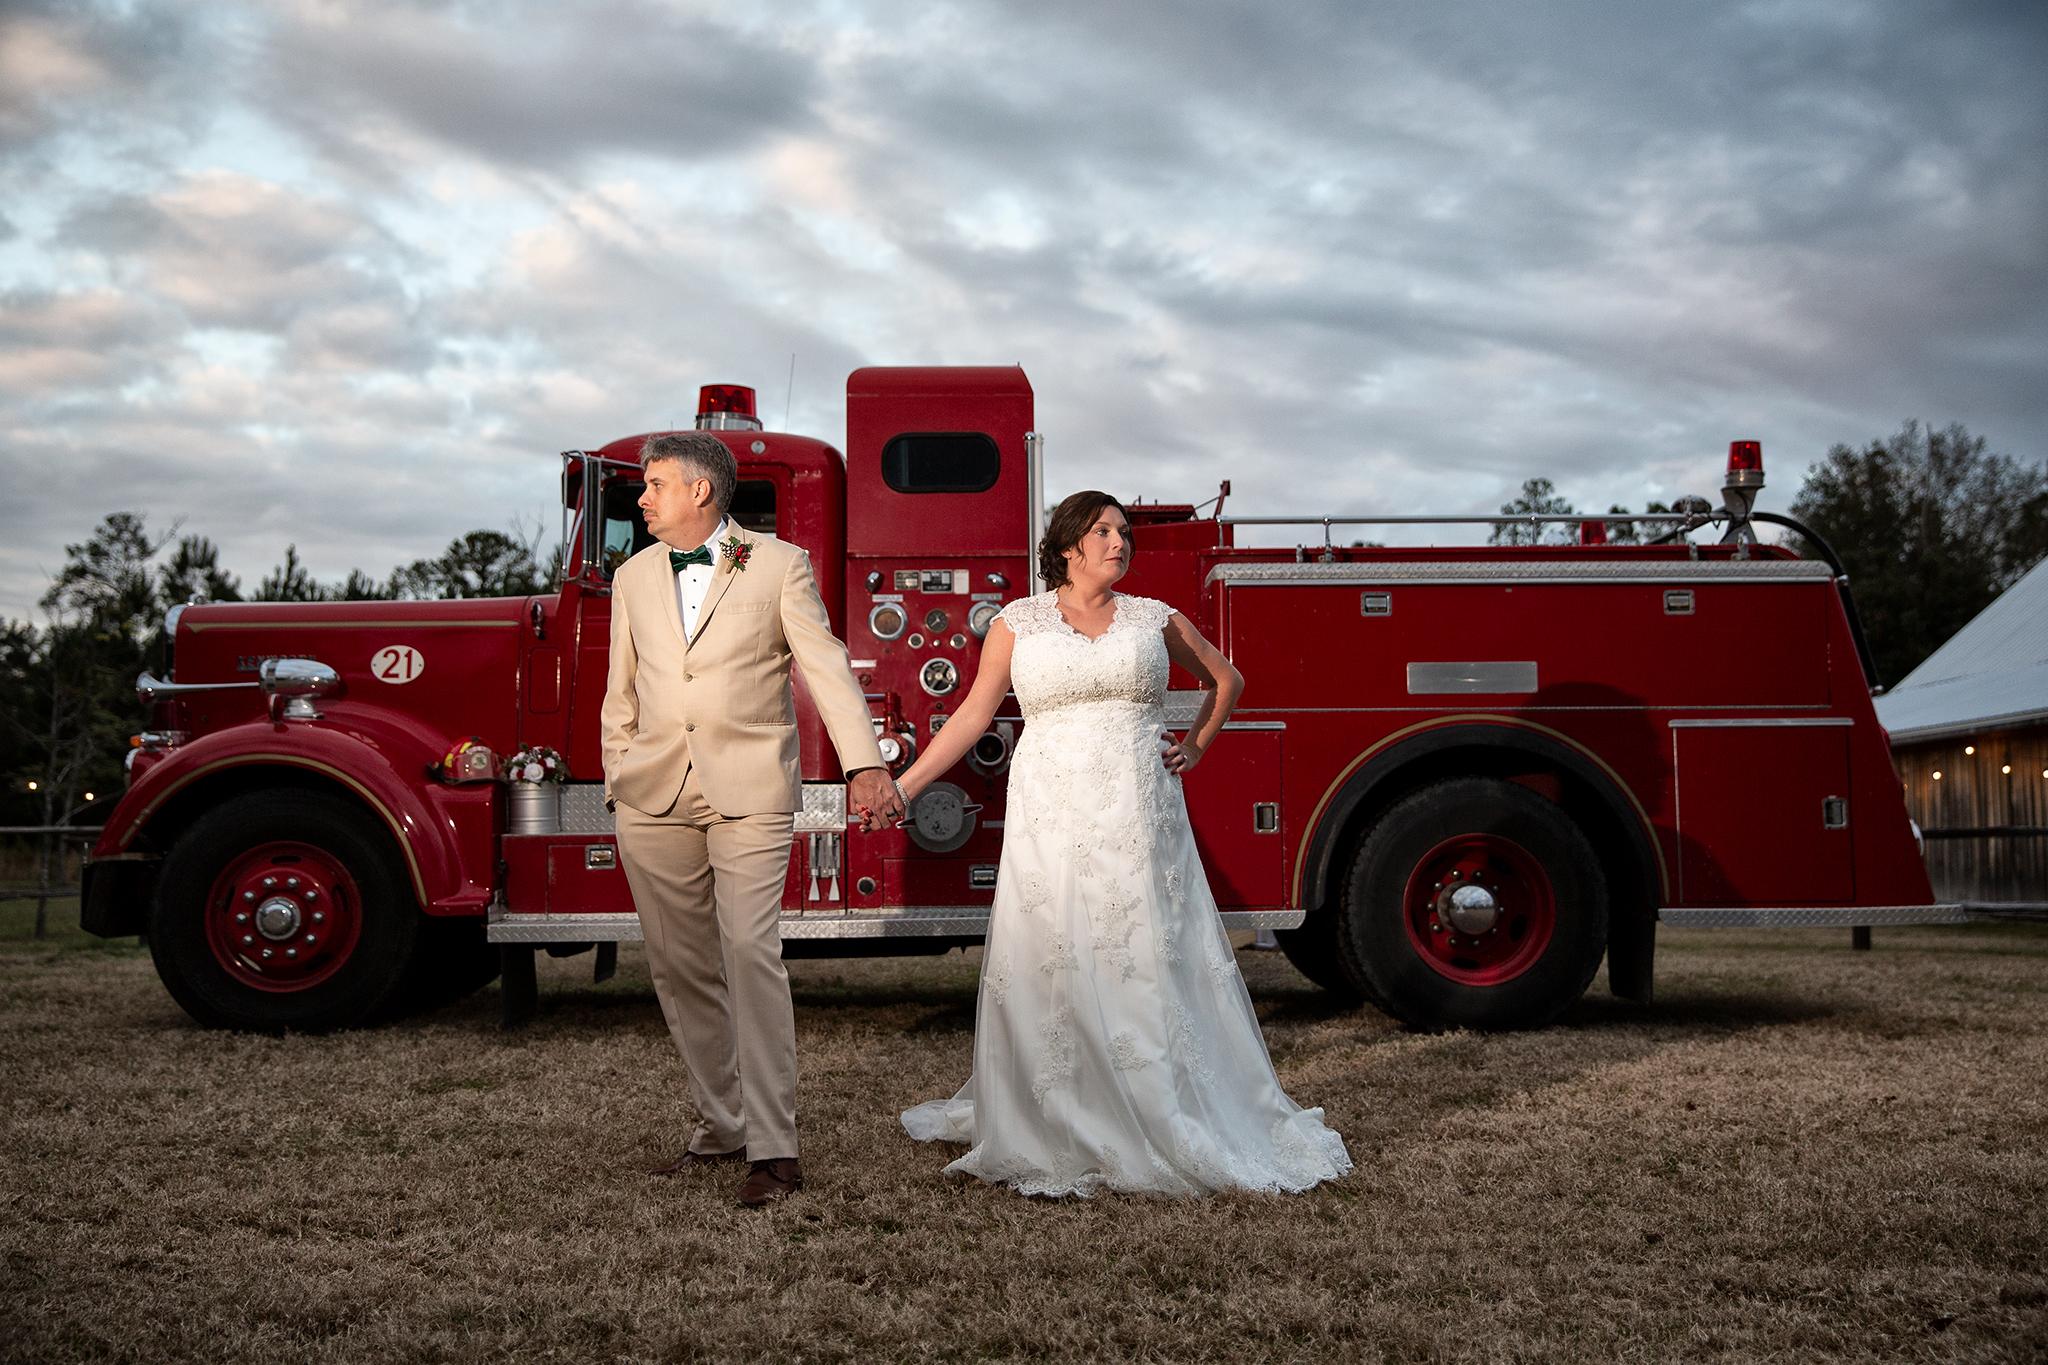 jennifer-billy-wedding-dez-merrow-photography-2018-barn-2.jpg